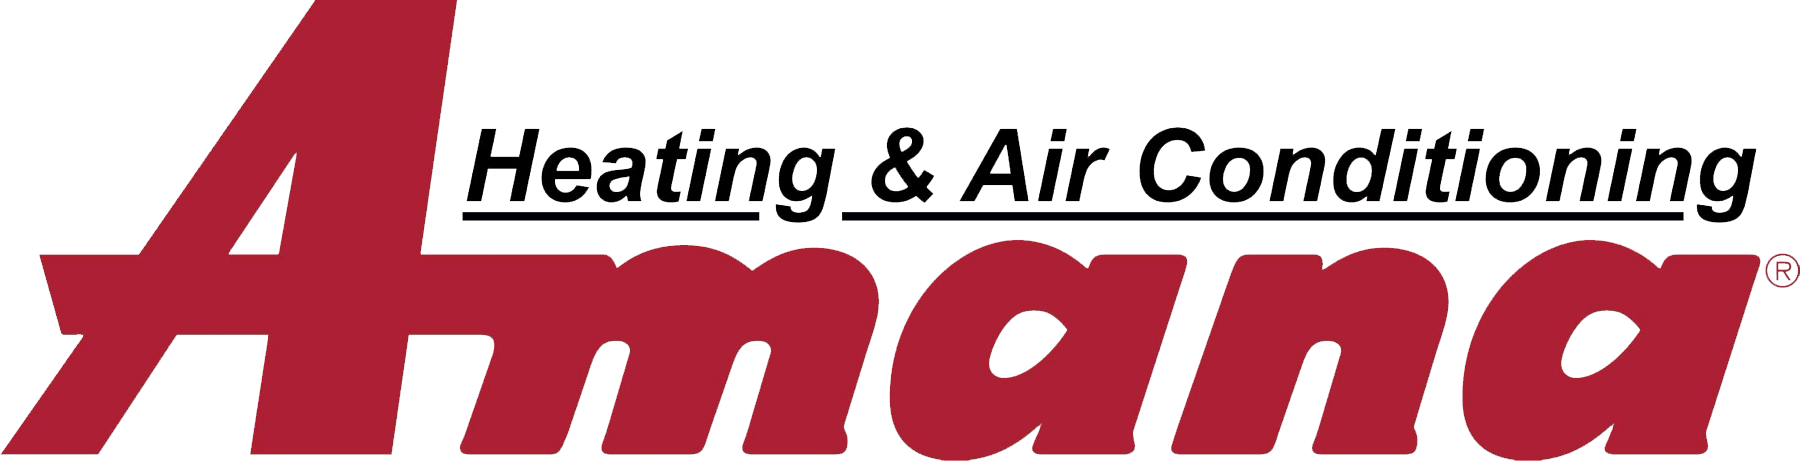 amana brand logo furnaces